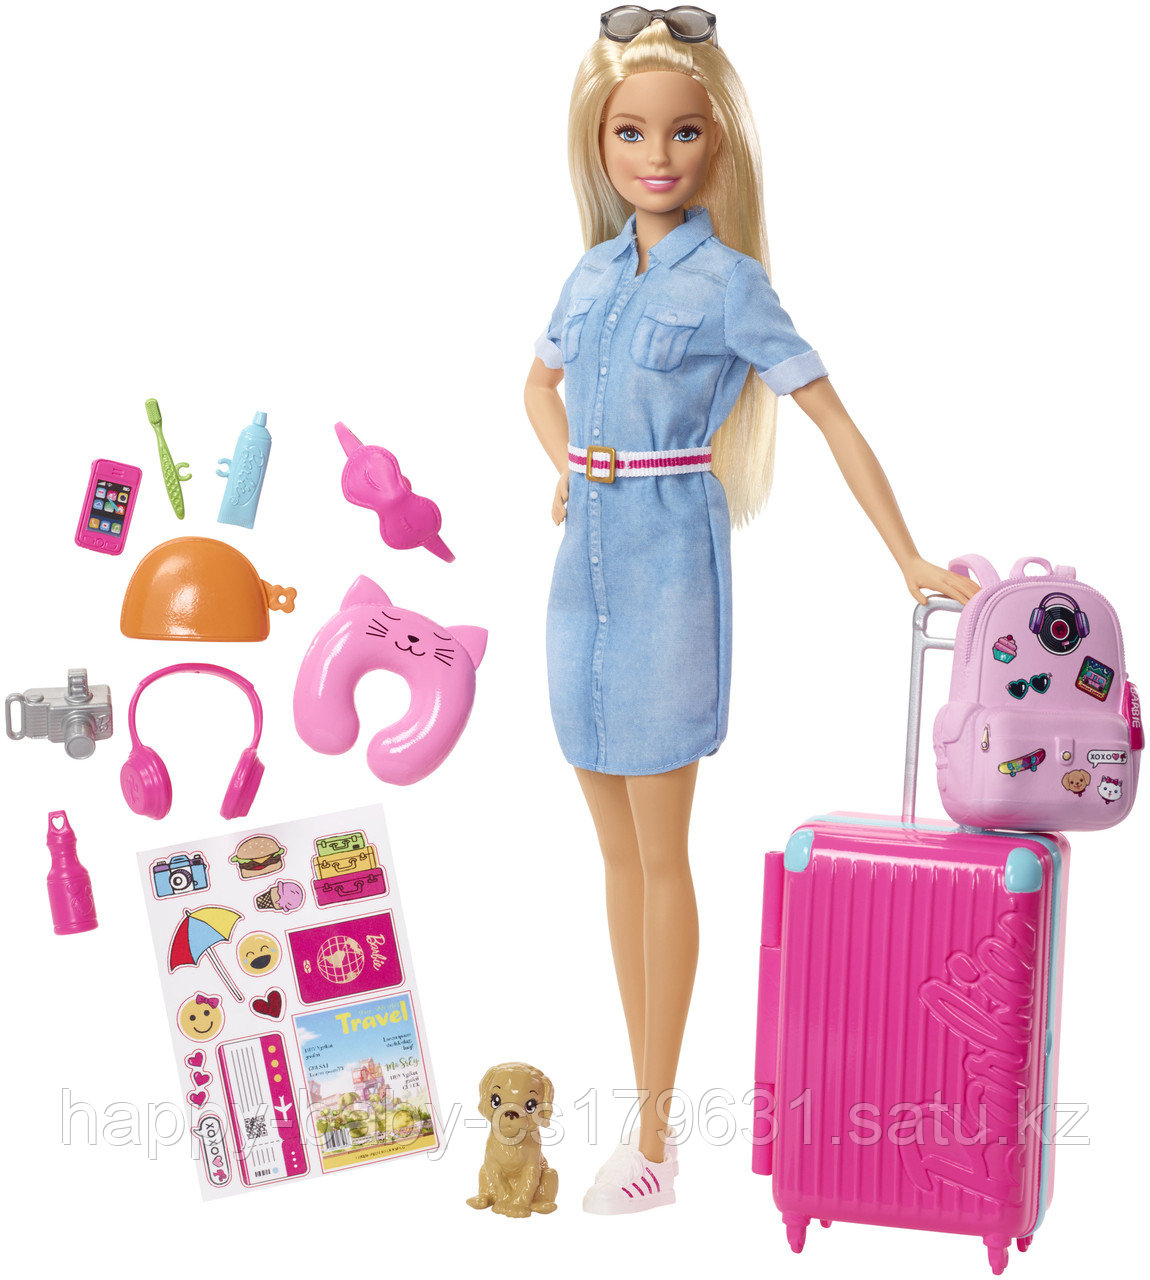 Mattel Barbie оригинал Барби Кукла из серии Путешествия